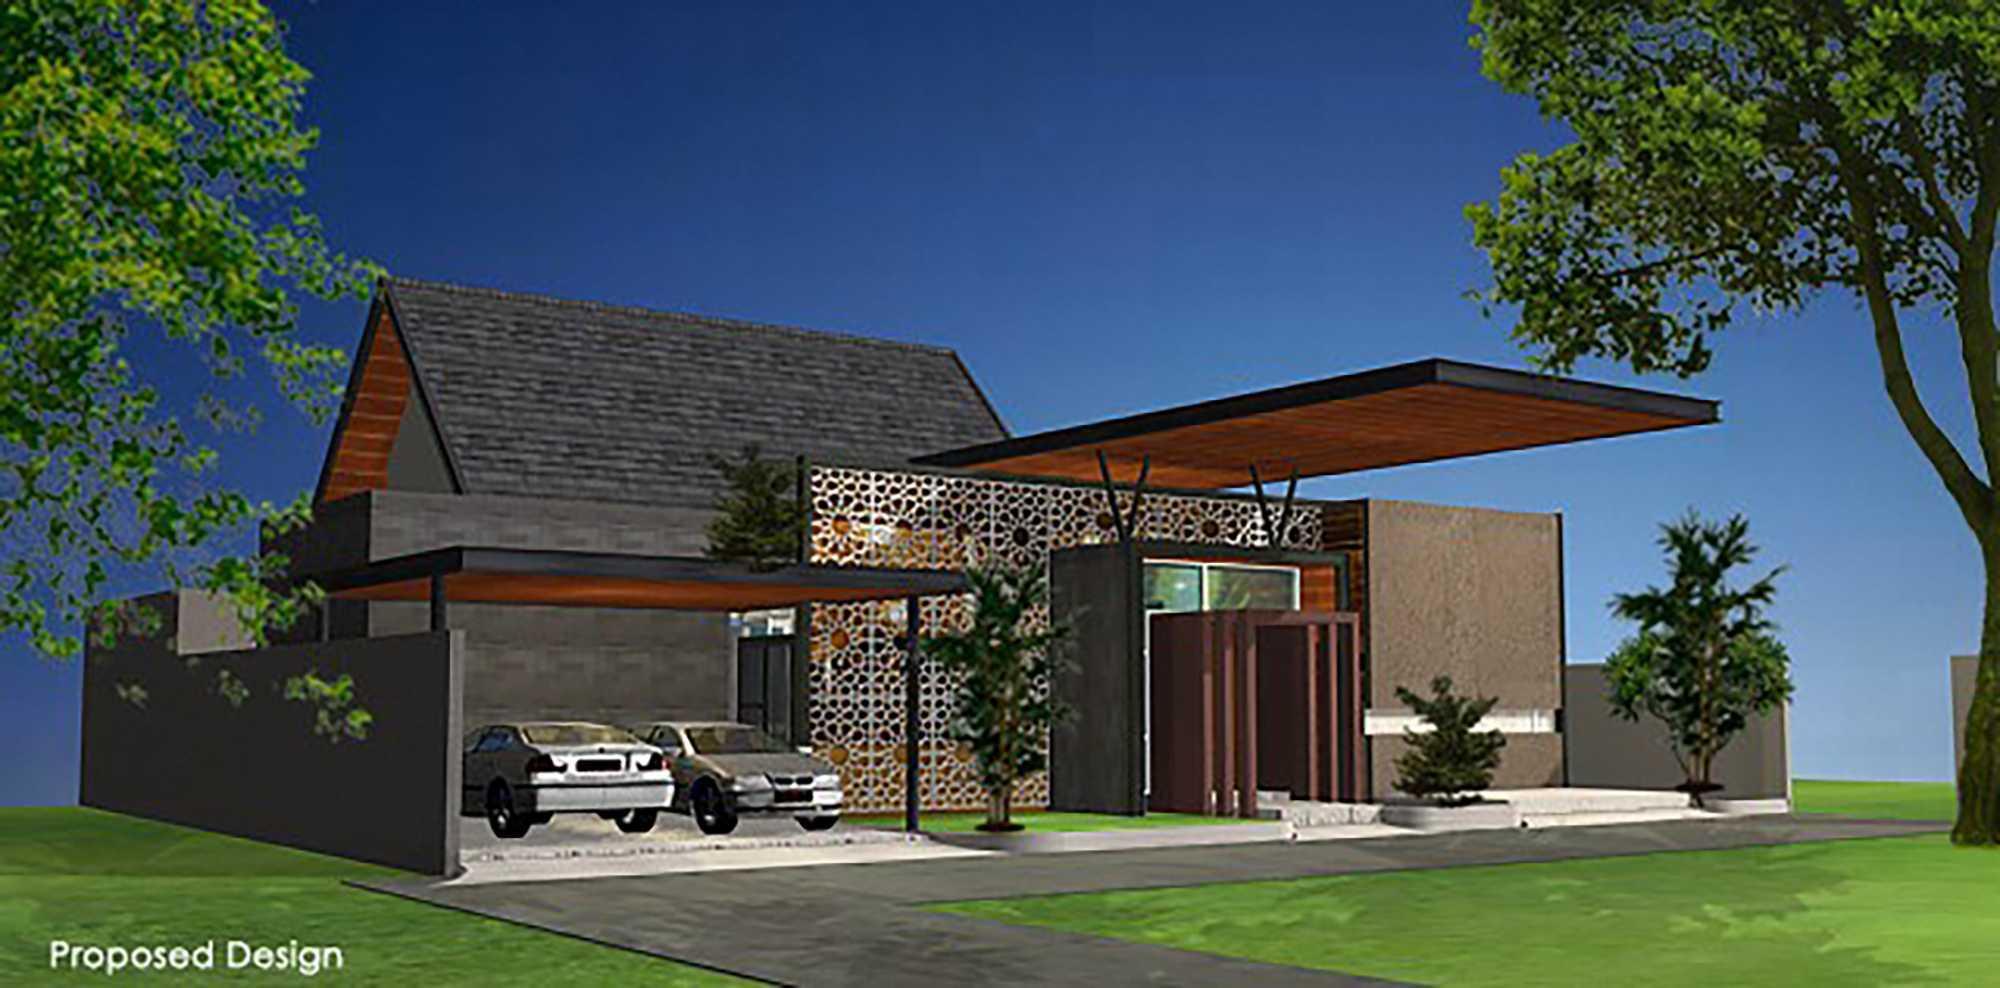 Alfaiz Design D+A House Pucang, Bawang, Banjarnegara, Jawa Tengah, Indonesia Pucang, Bawang, Banjarnegara, Jawa Tengah, Indonesia Alfaiz-Design-Da-House Modern 100540